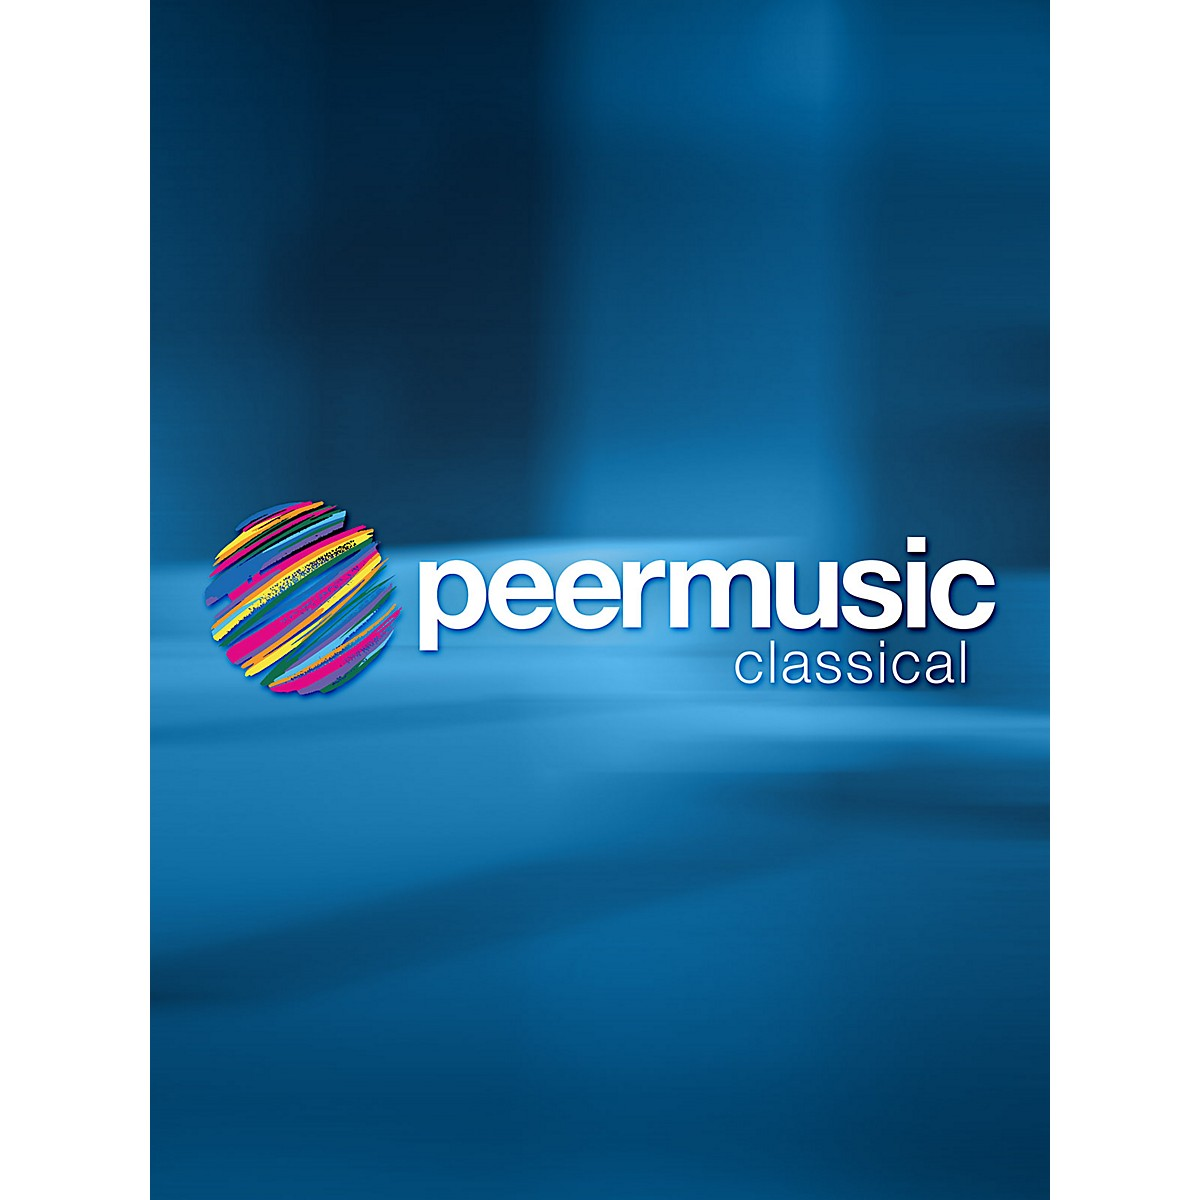 Peer Music Partita (Oboe, Bassoon and Piano) Peermusic Classical Series by David Diamond